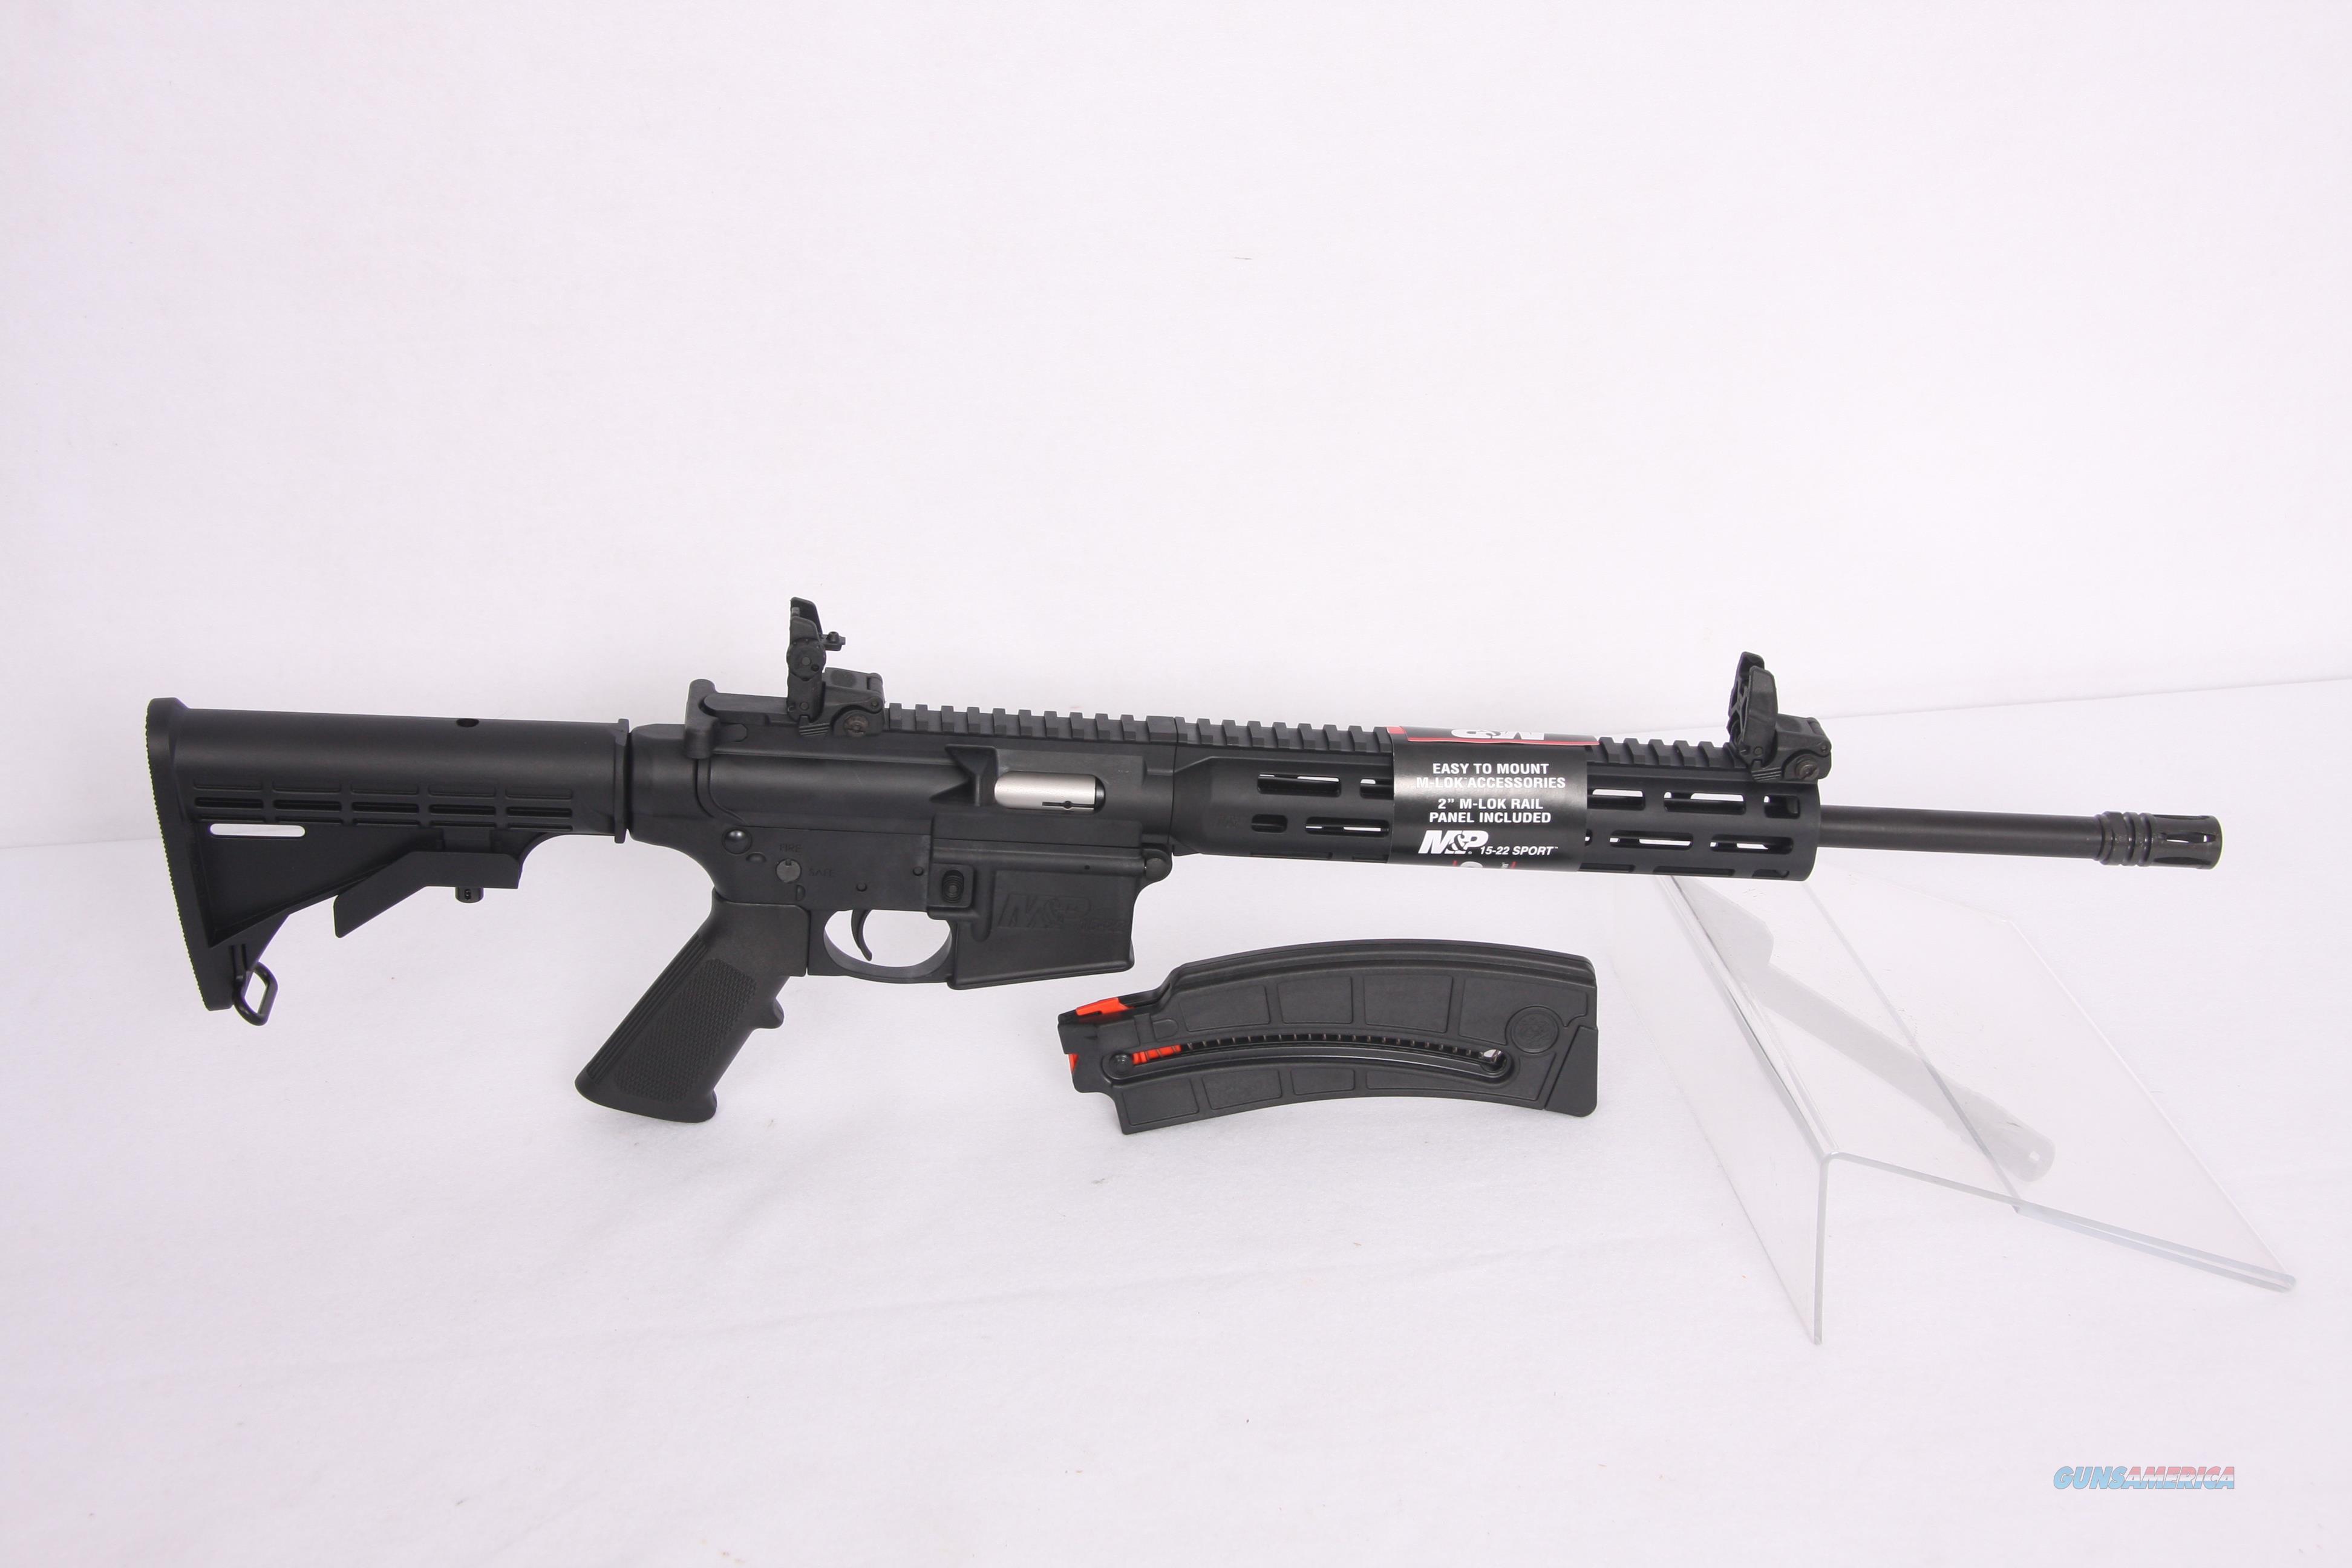 SW MP 15-22 Sport .22Lr  Guns > Rifles > Smith & Wesson Rifles > M&P